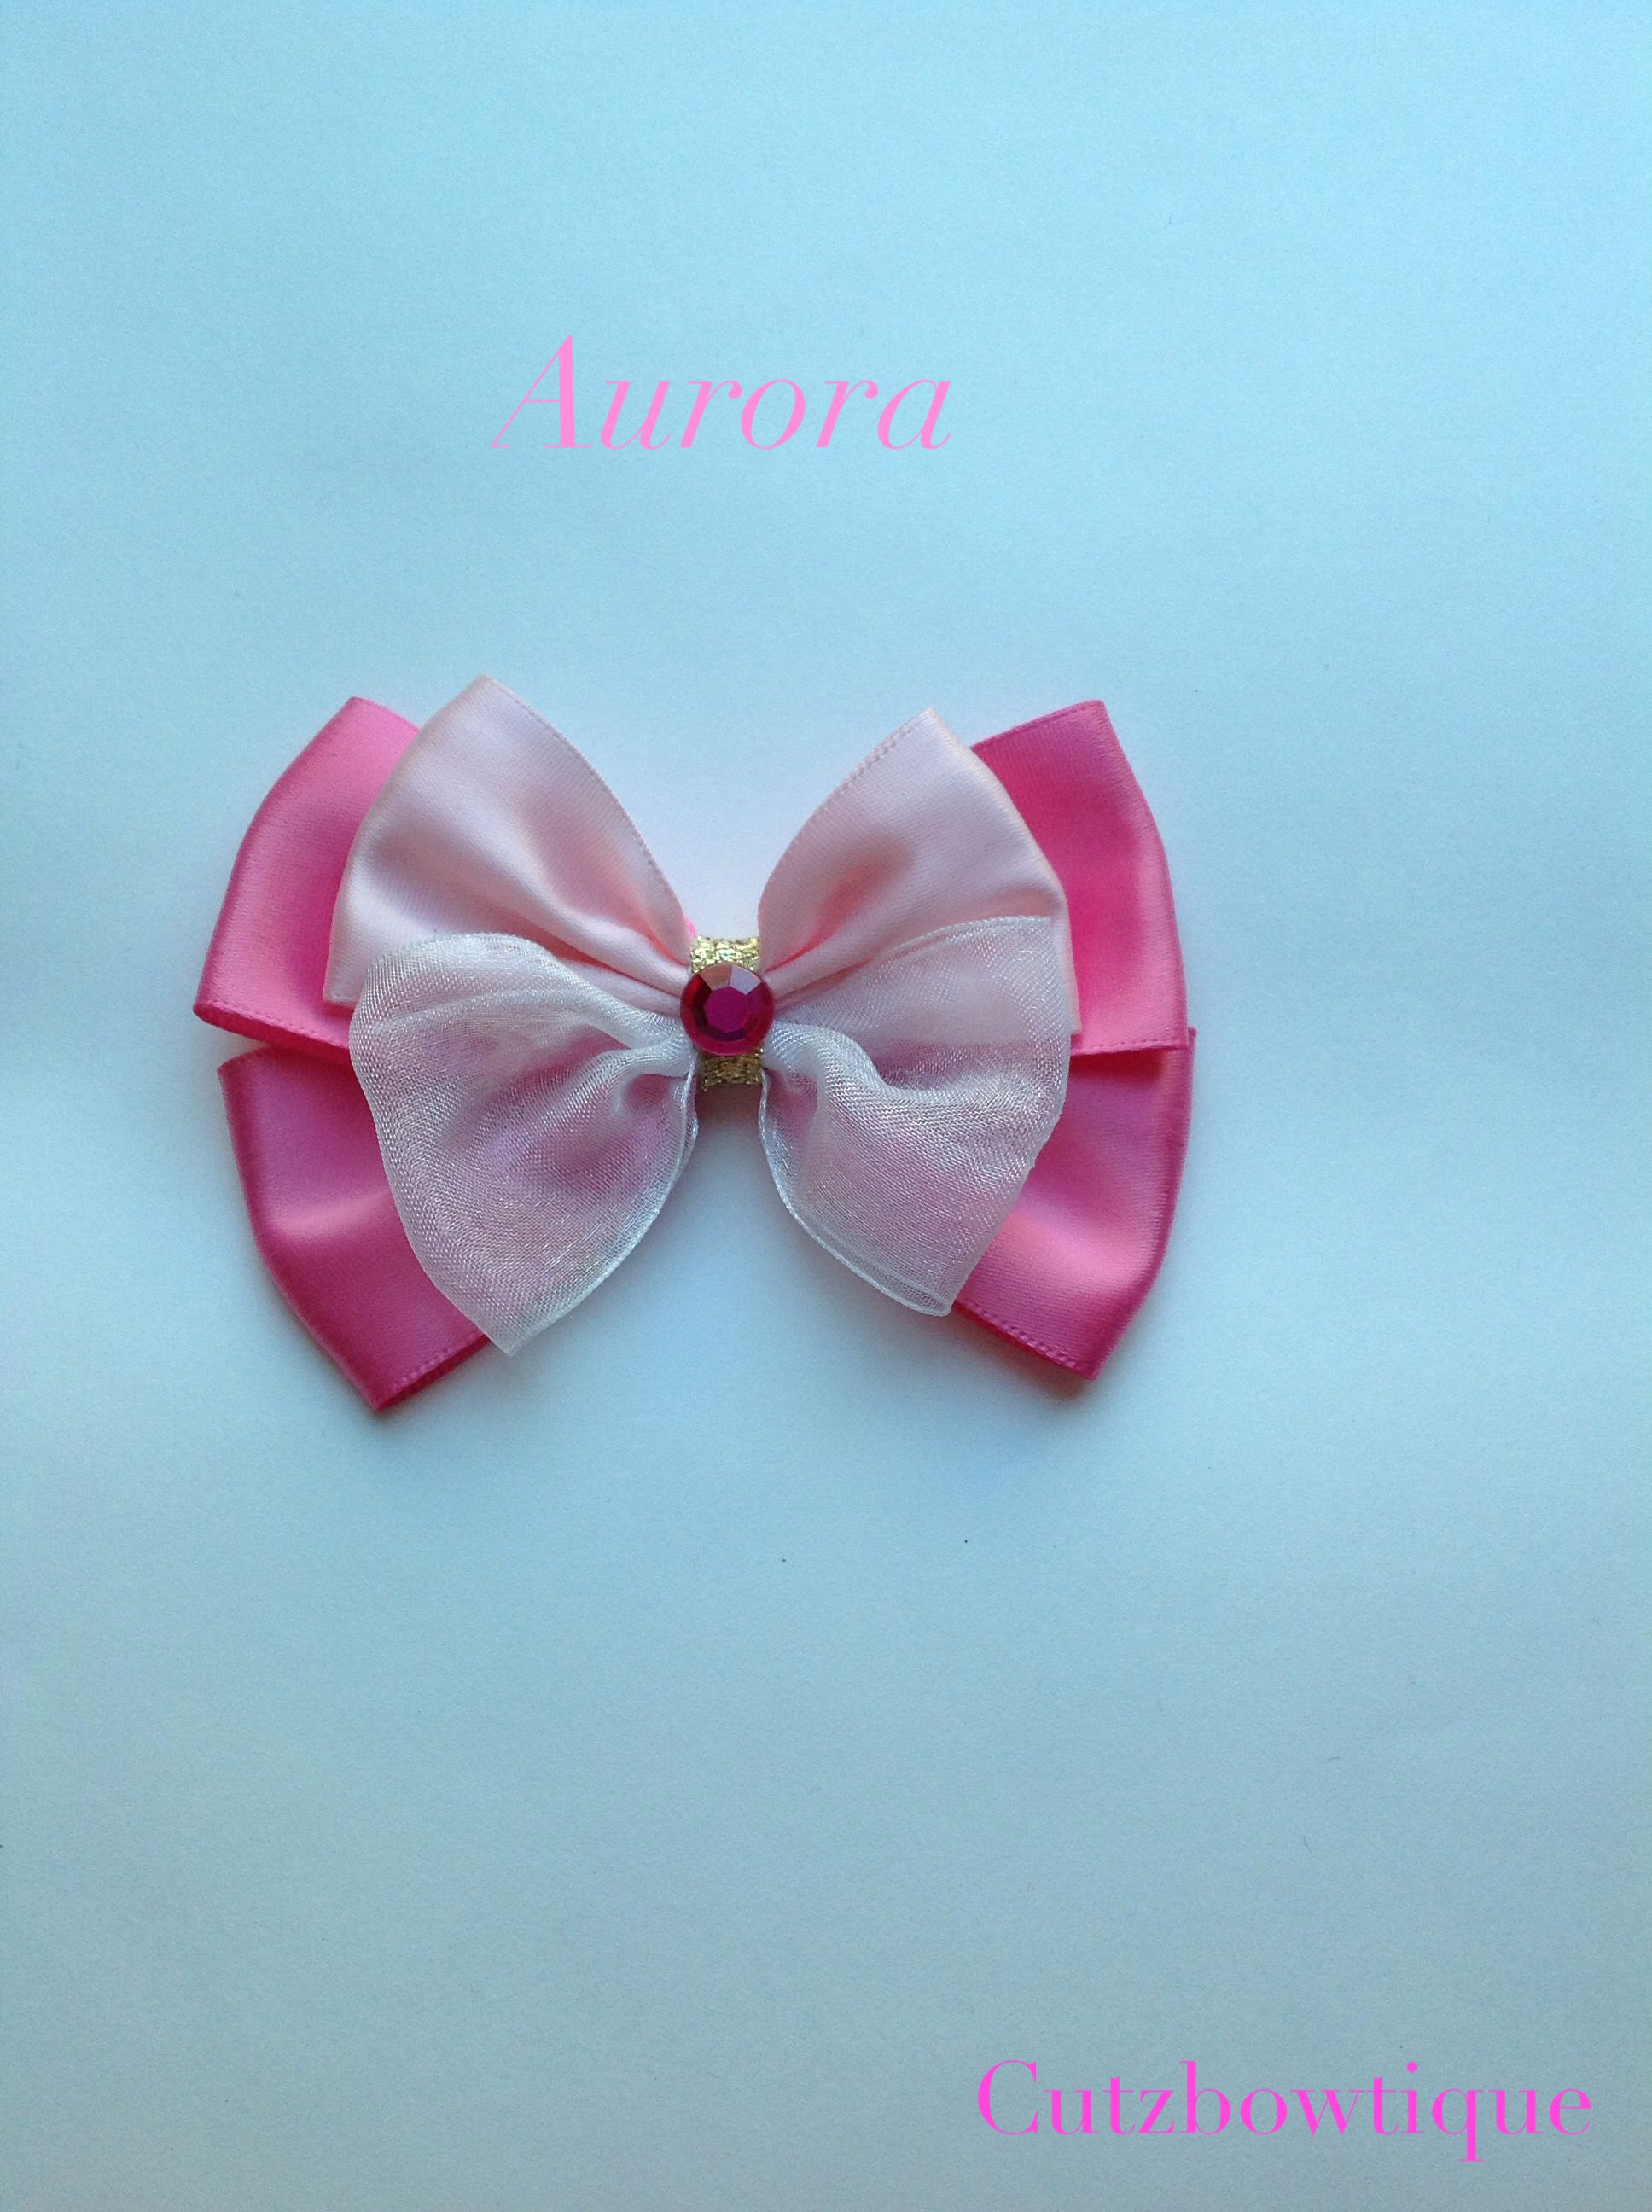 Handmade Disney Aurora Hair Bow